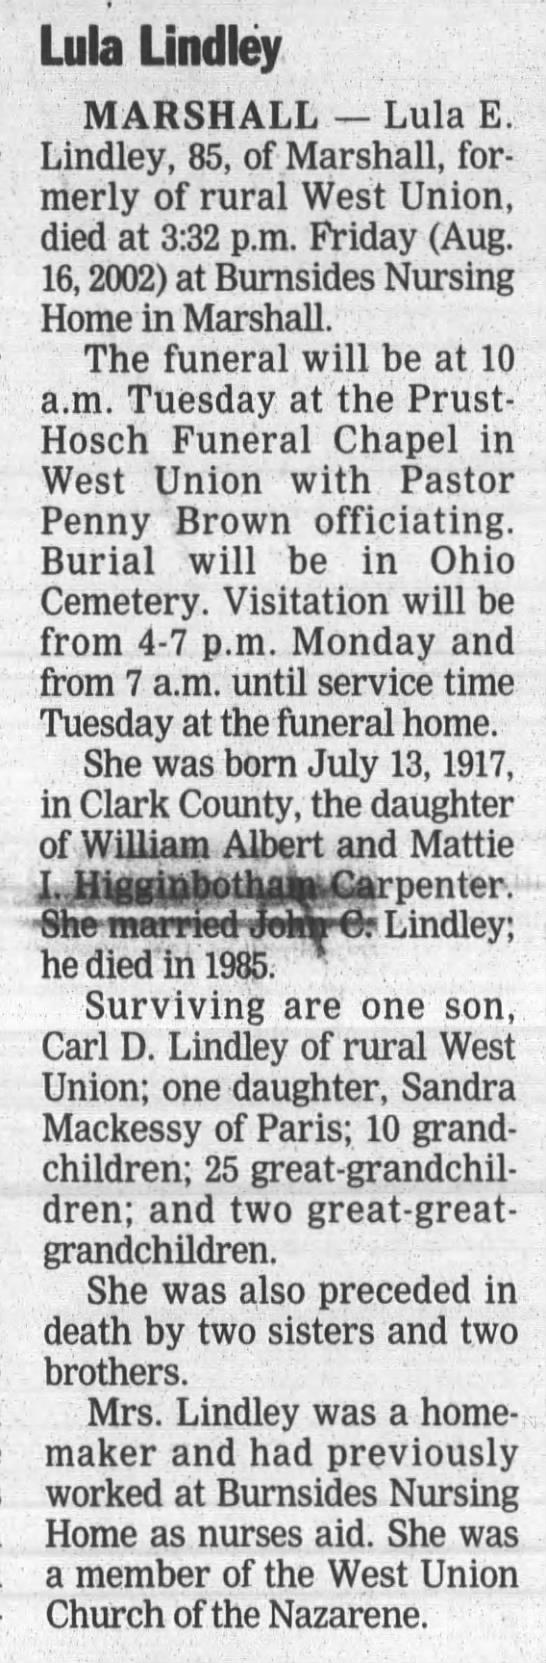 Lula Lindley-16 Aug.2002 - Lula Lindley MARSHALL Lula E. Lindley, 85, of...